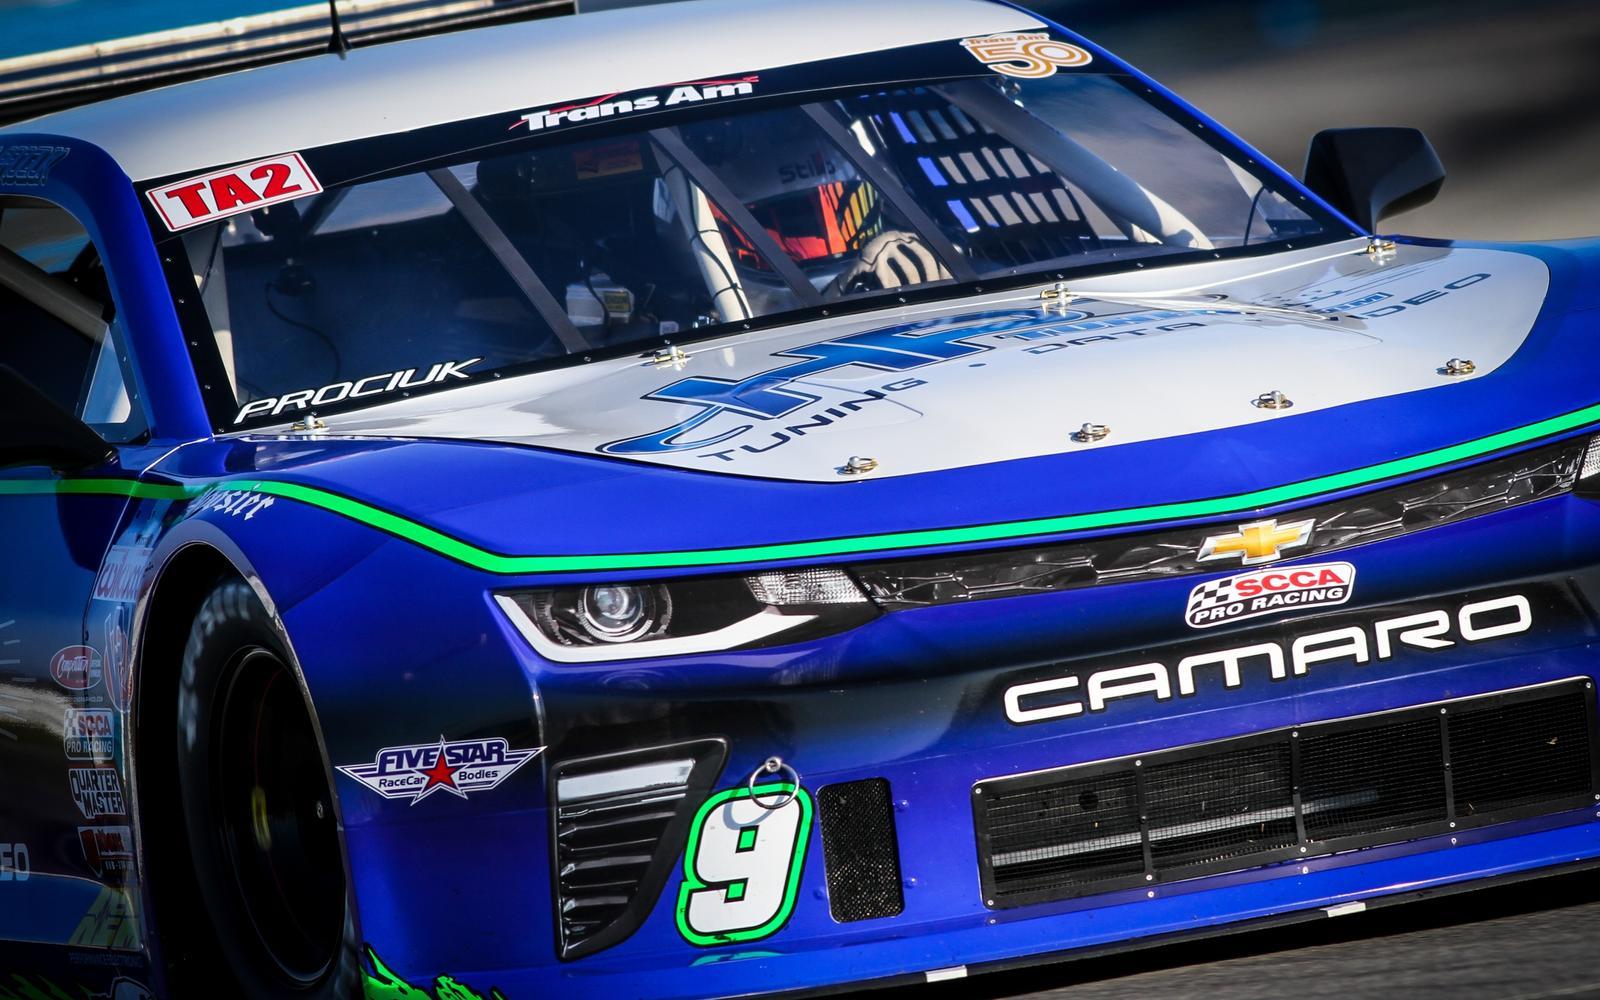 Trans Am Series returns to Chevrolet Detroit Belle Isle